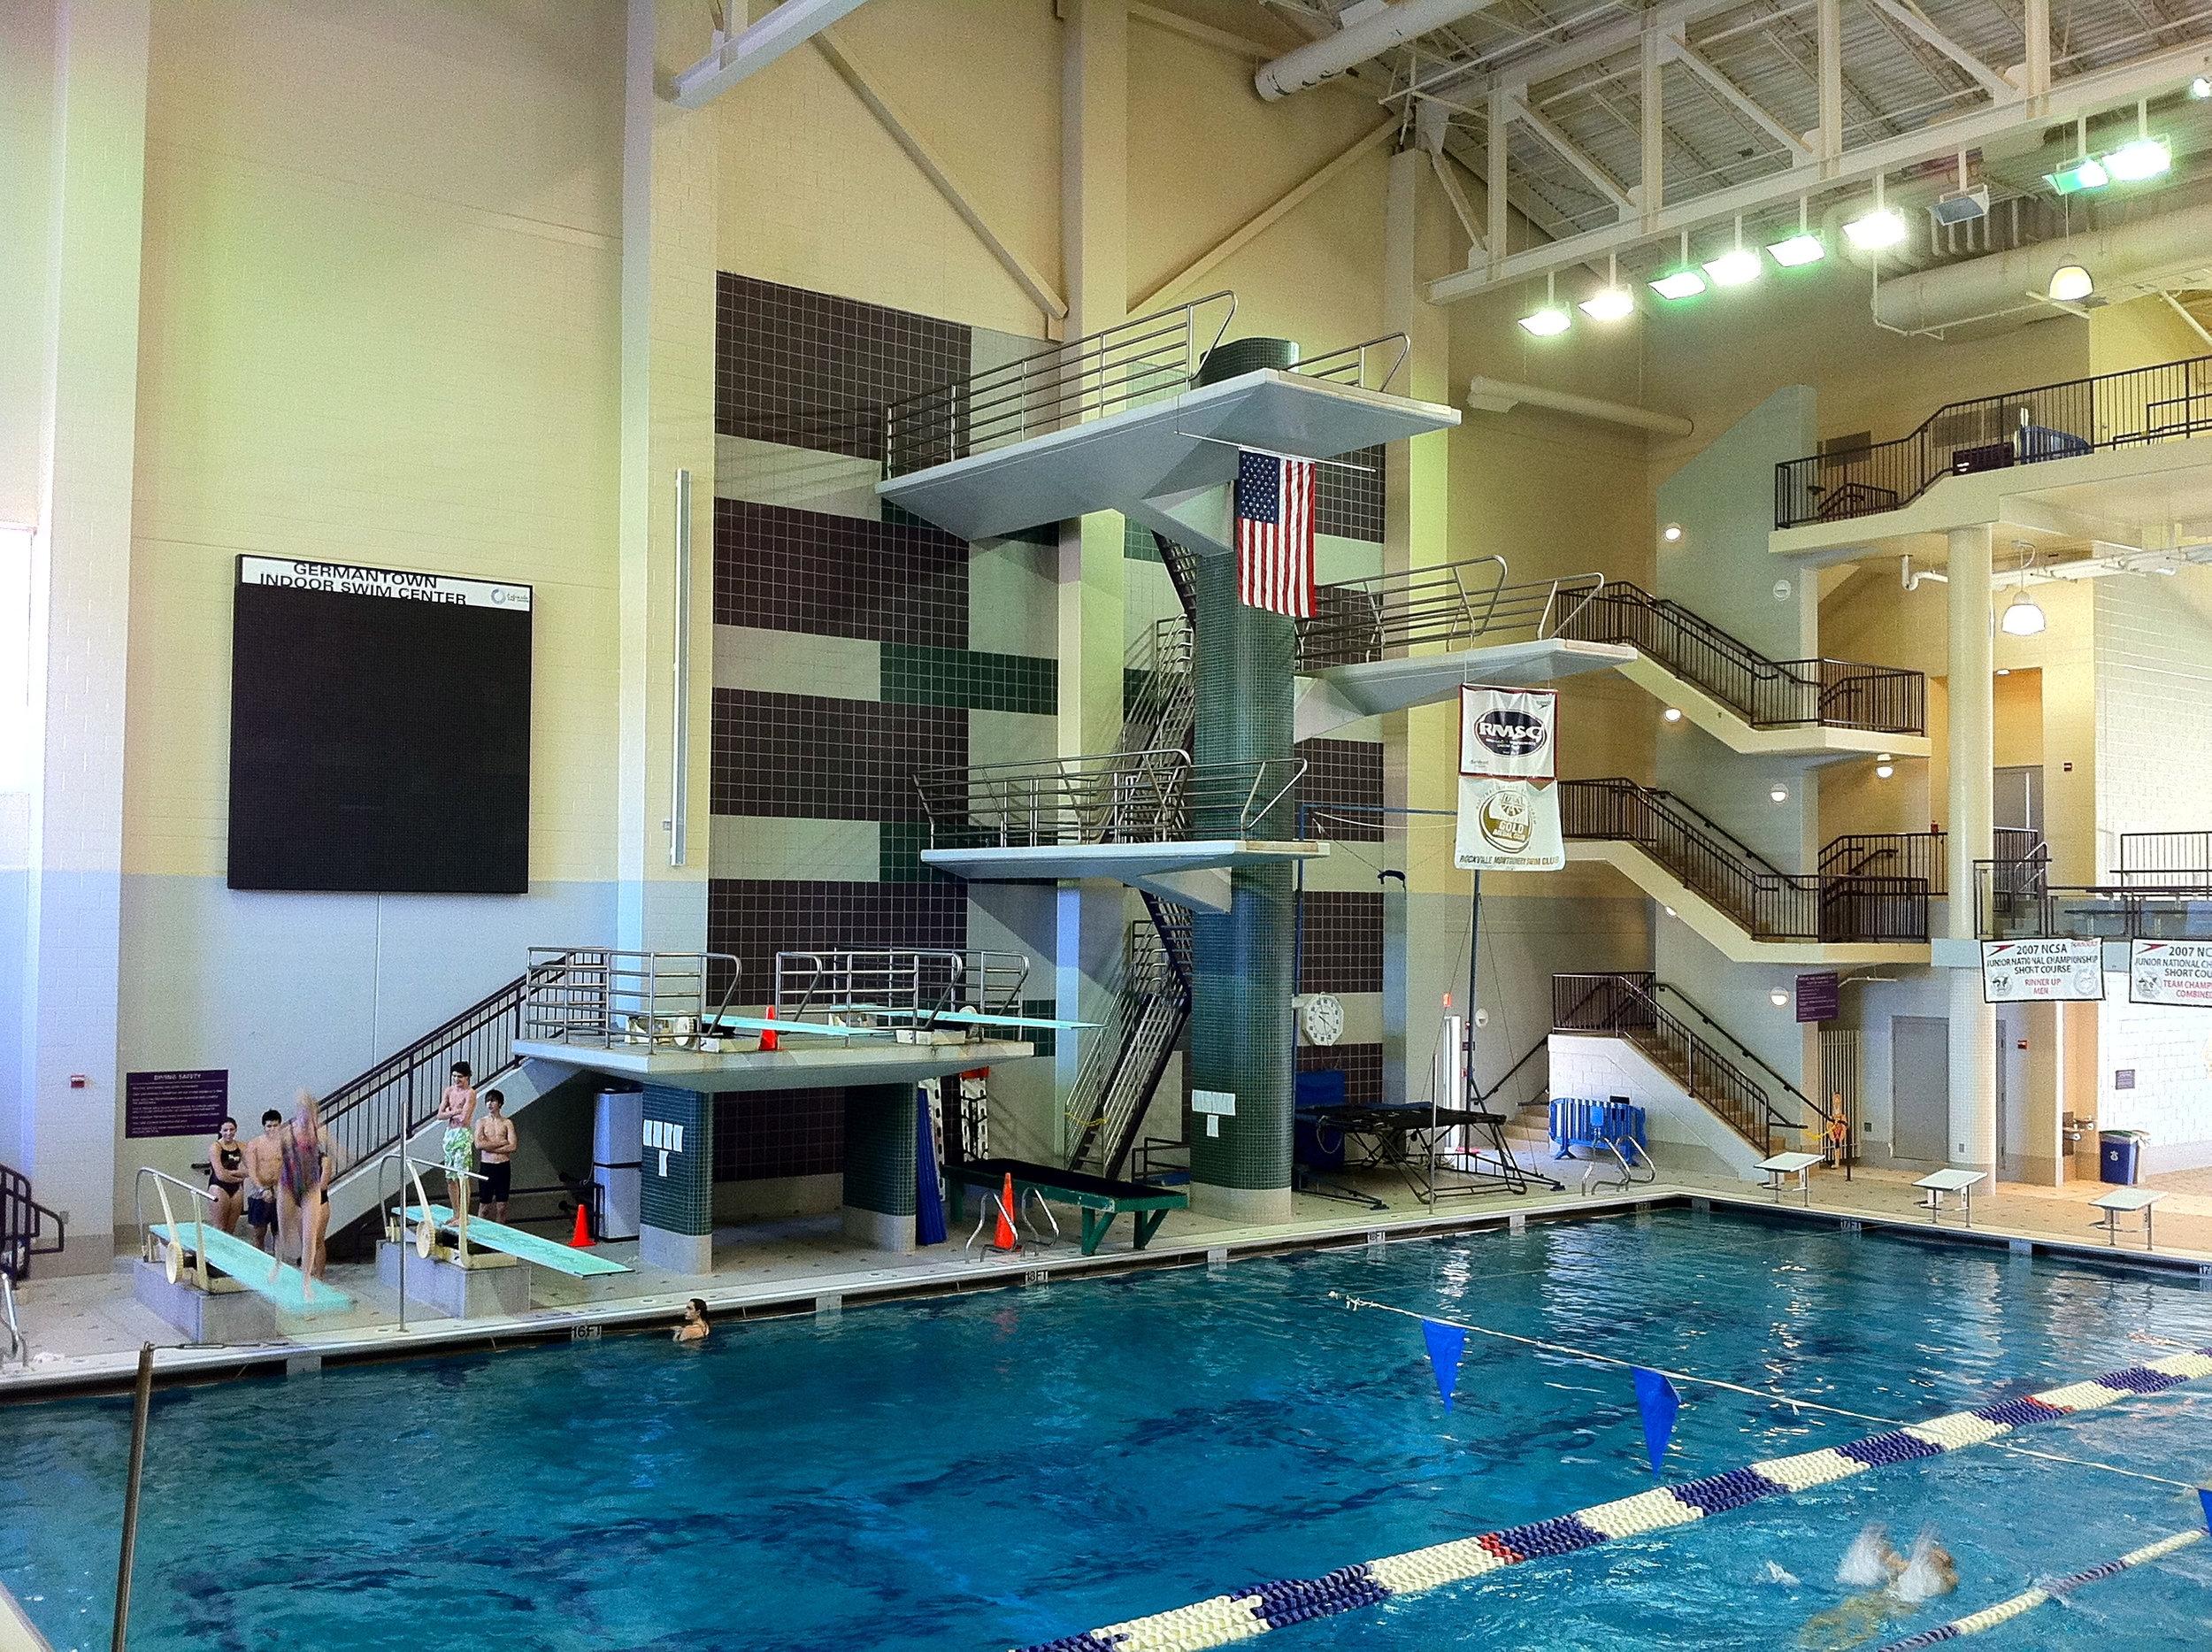 The Germantown Indoor Swim Center in Boyds, Maryland.